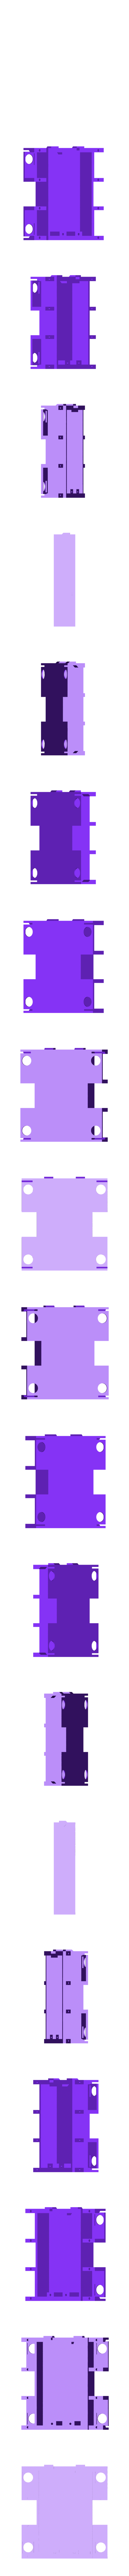 m-body_base.stl Download free STL file Ez Arduino Spidey - 12 DOF Quadruped Robot • 3D printing object, manic-3d-print